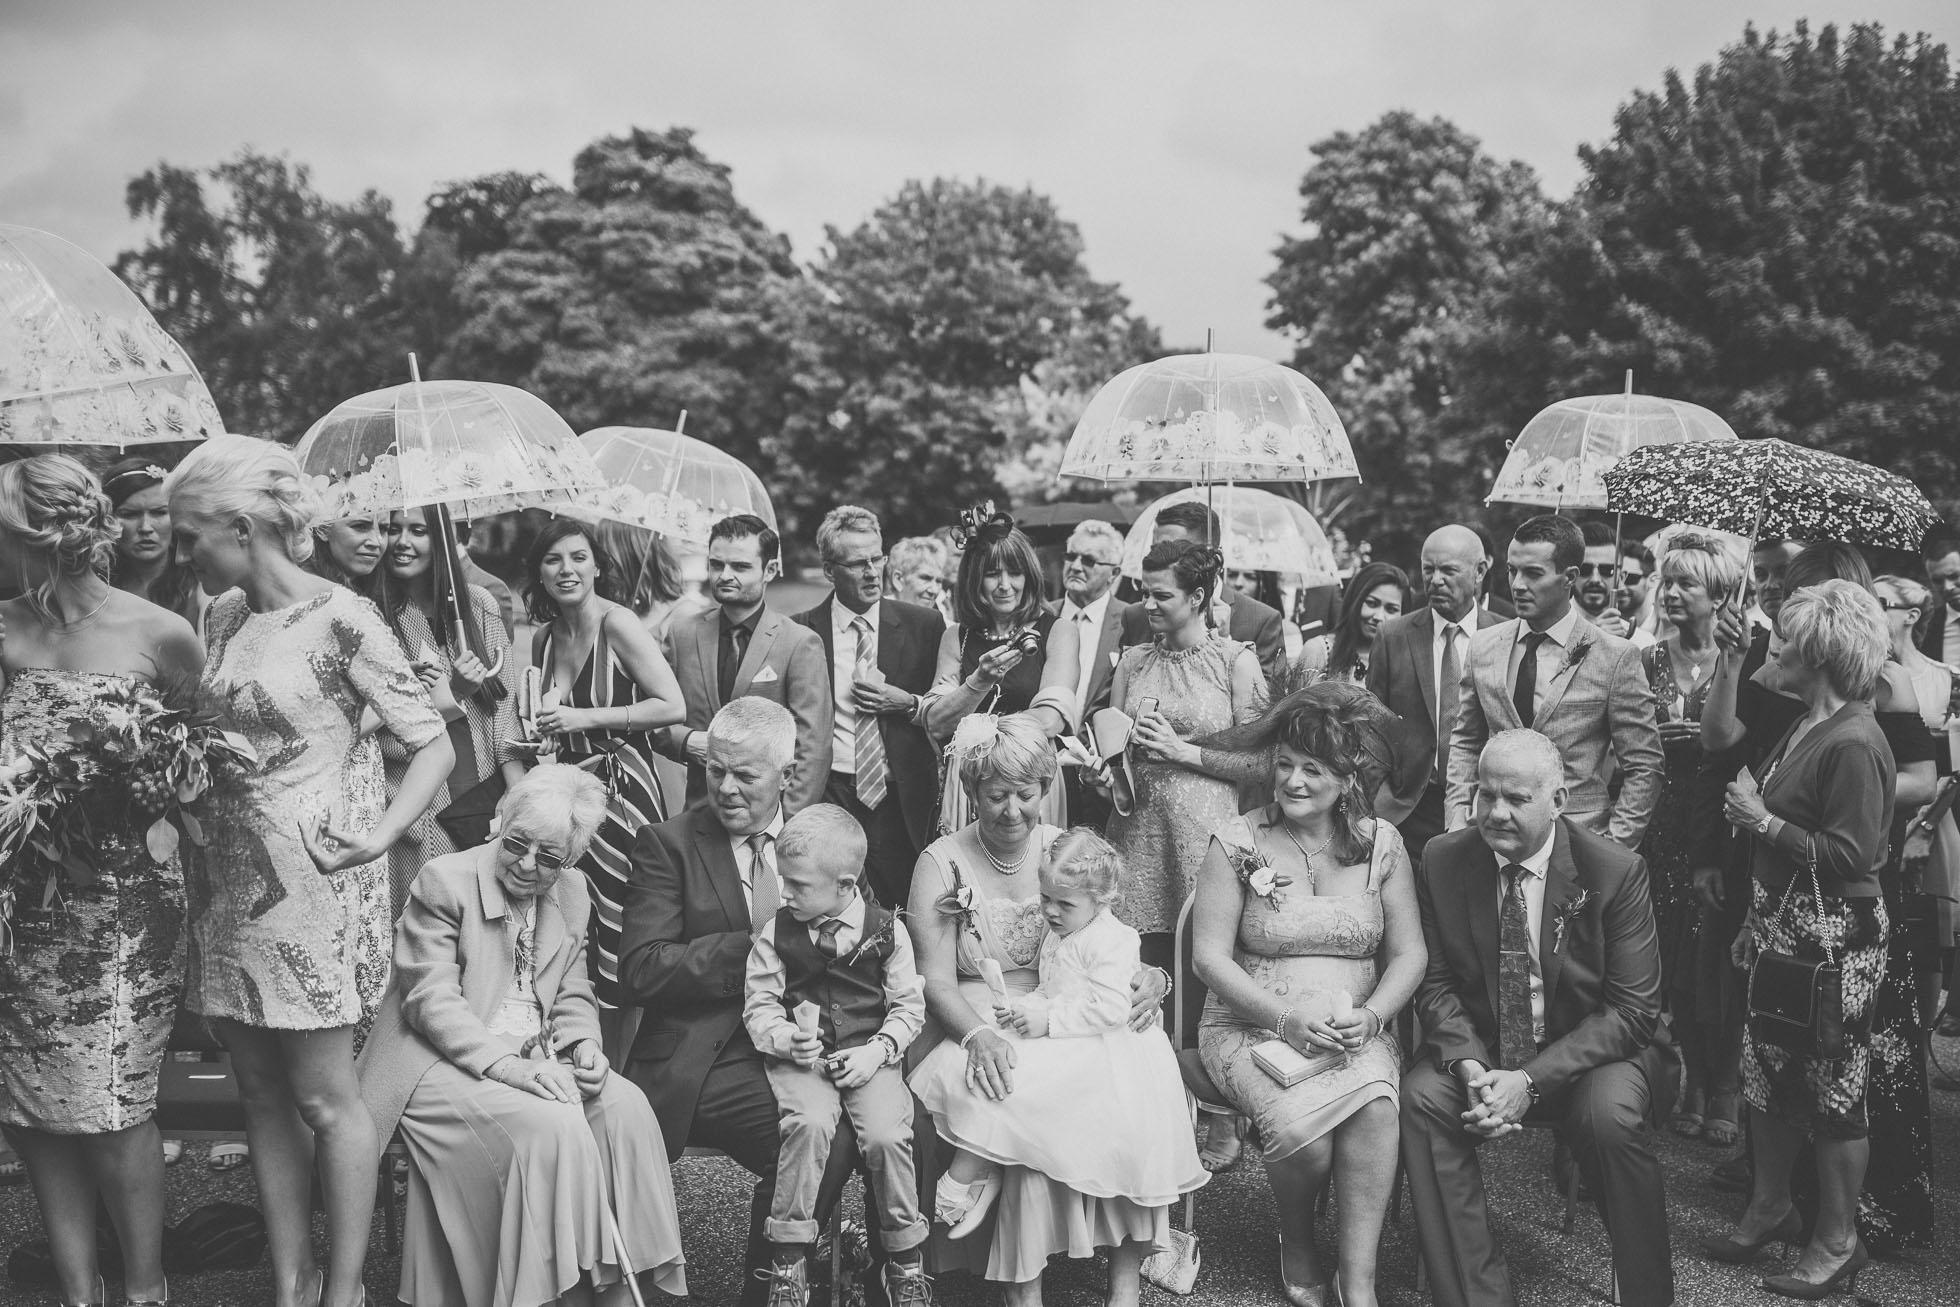 sheffield-botanical-gardens-wedding-photographer-26.jpg